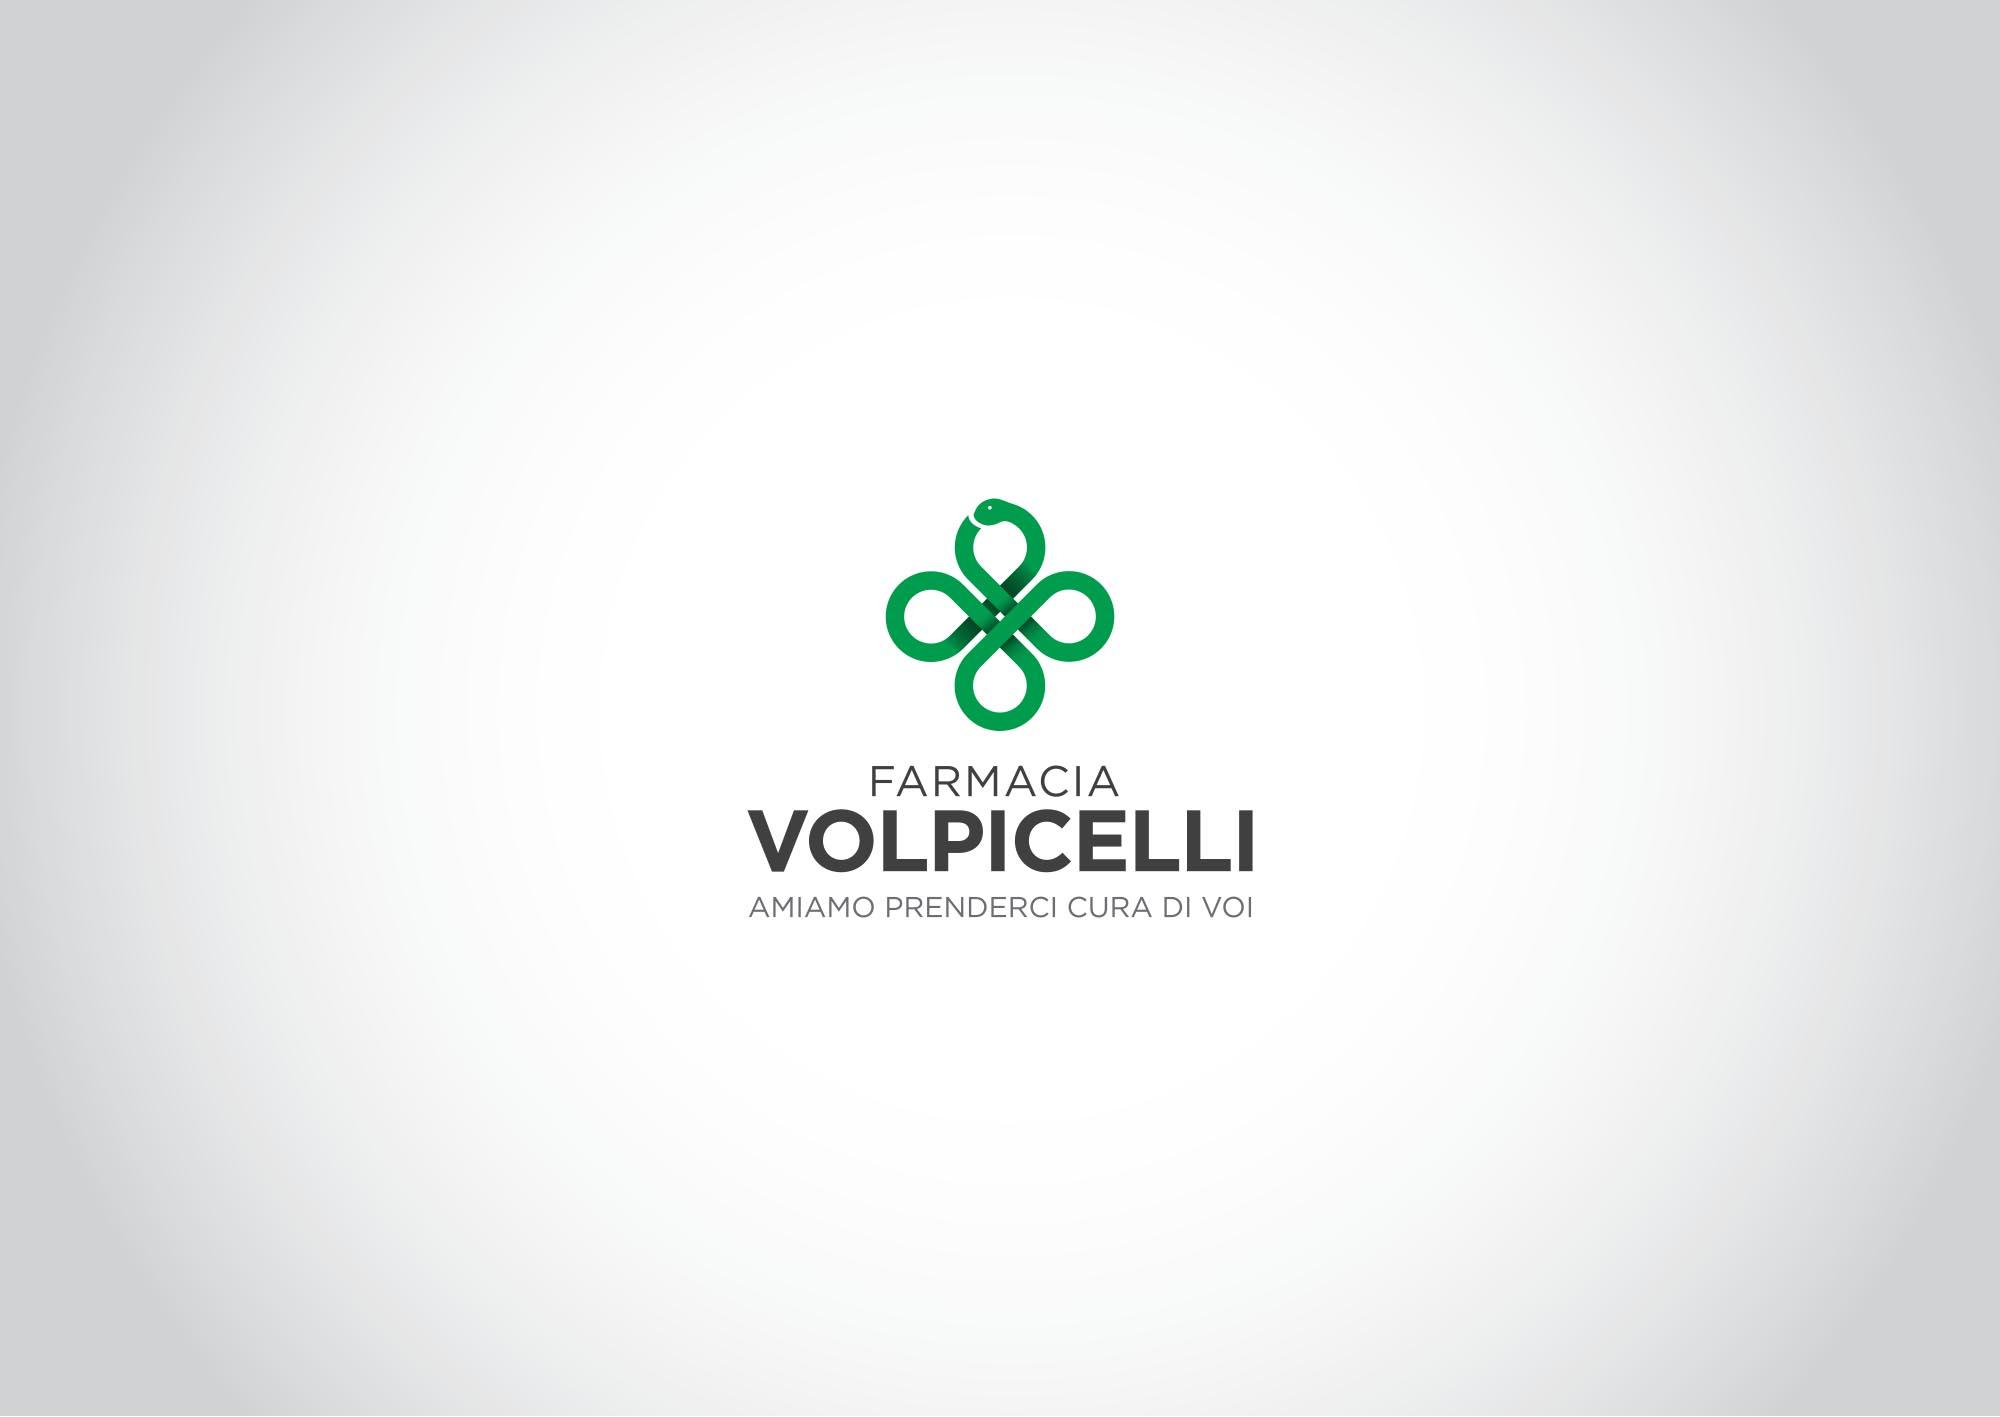 FARMACIAVOLPICELLI_logo_2